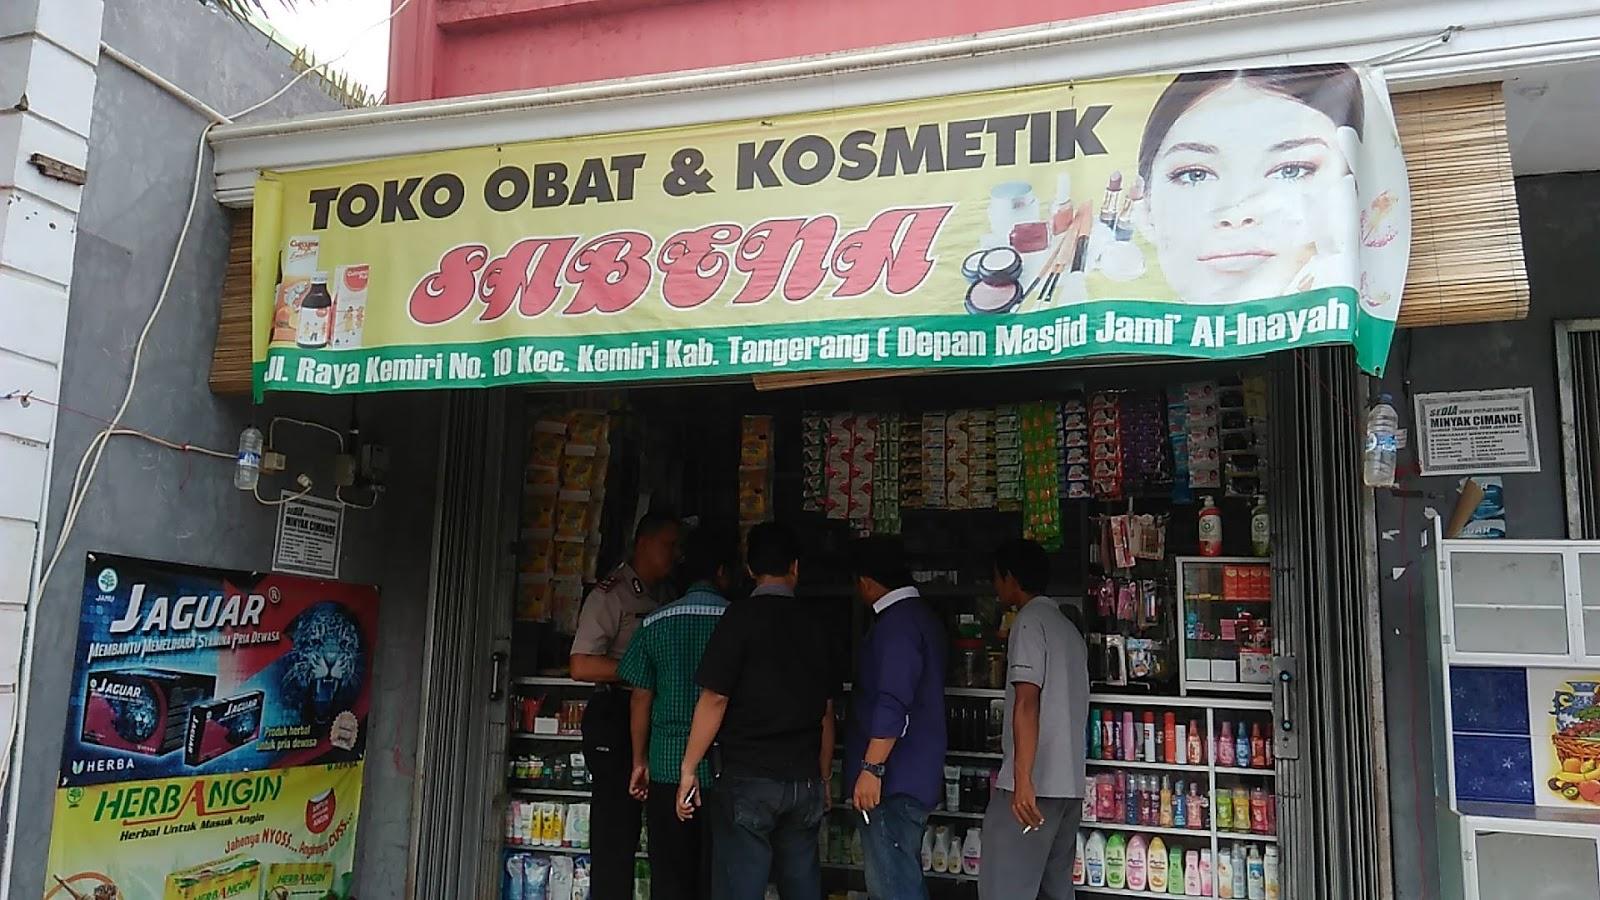 Toko Kosmetik Nada Pasar Tebet - Jual Peralatan Kosmetik ...